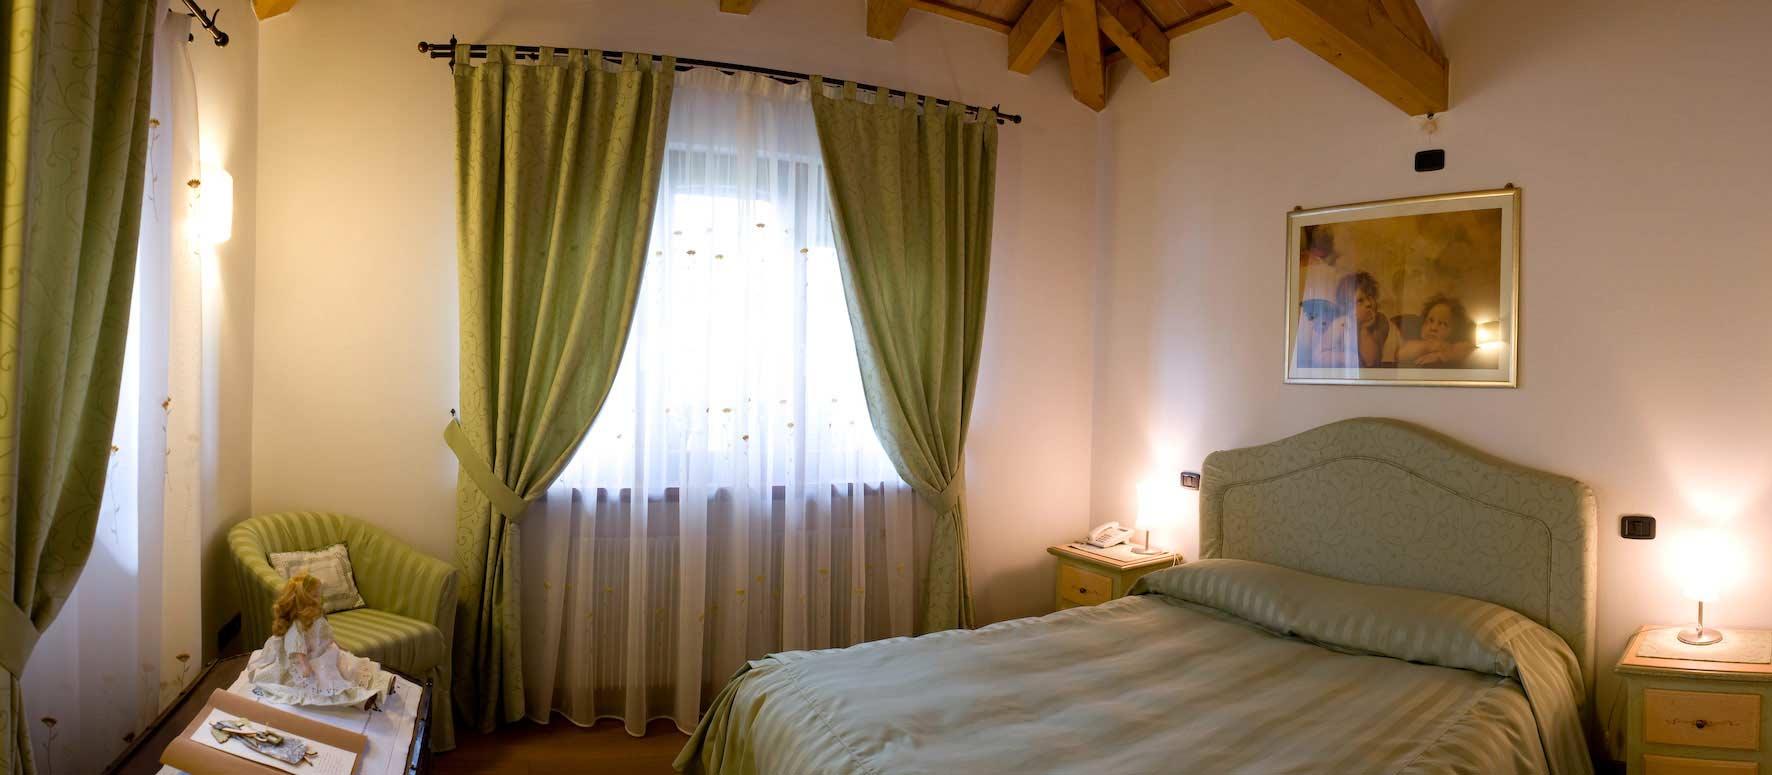 Camera Matrimoniale A Udine.Dormire A Udine Camere Udine Prenotare E Dormire In Agriturismo Udine